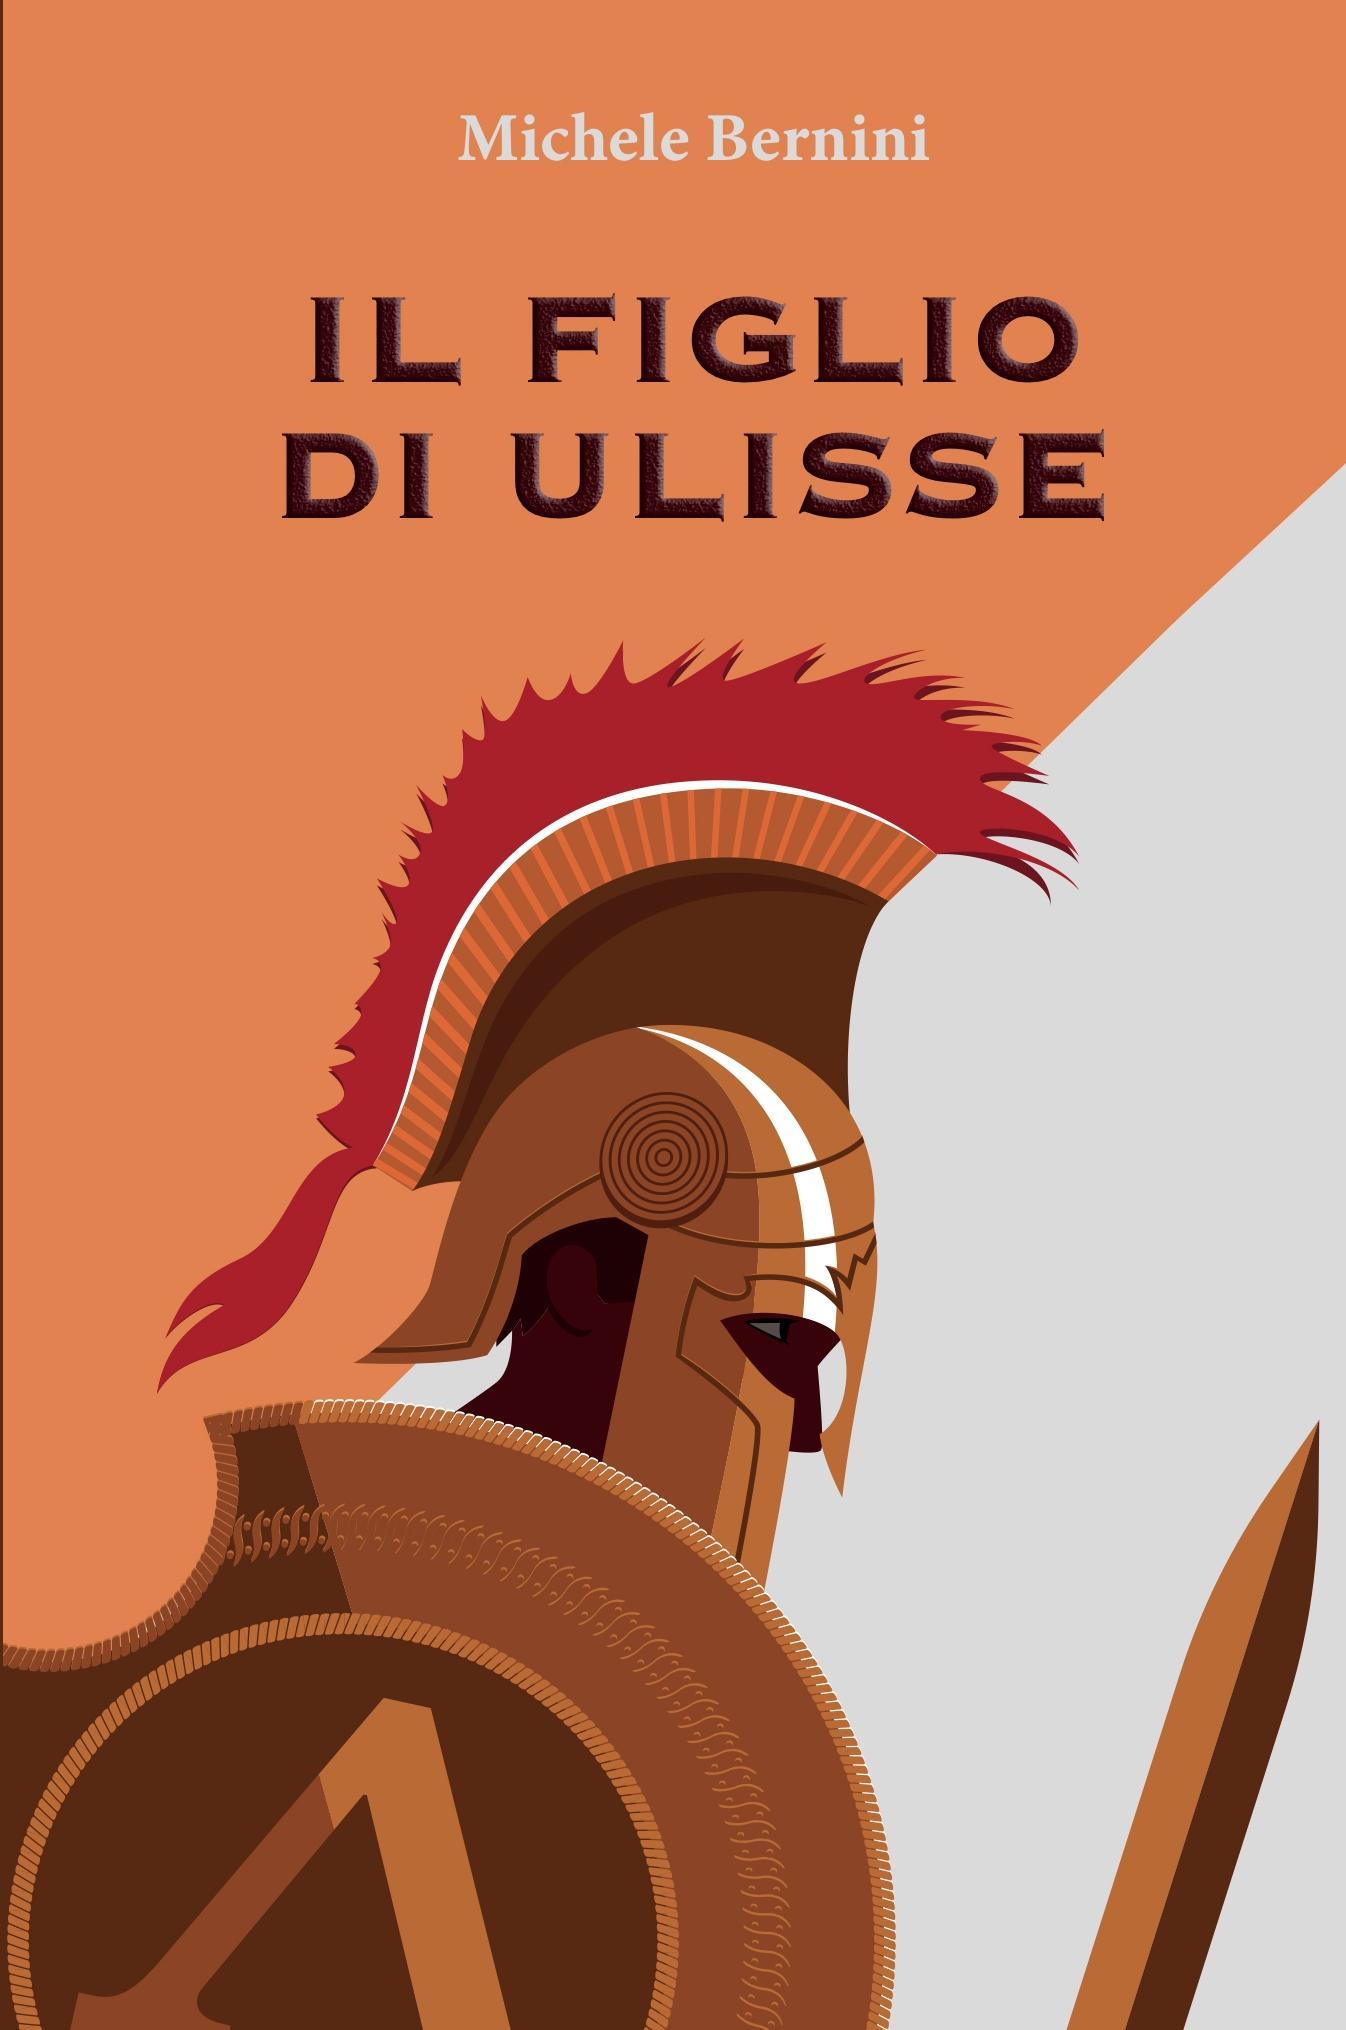 trojan sword and shield - 800×851